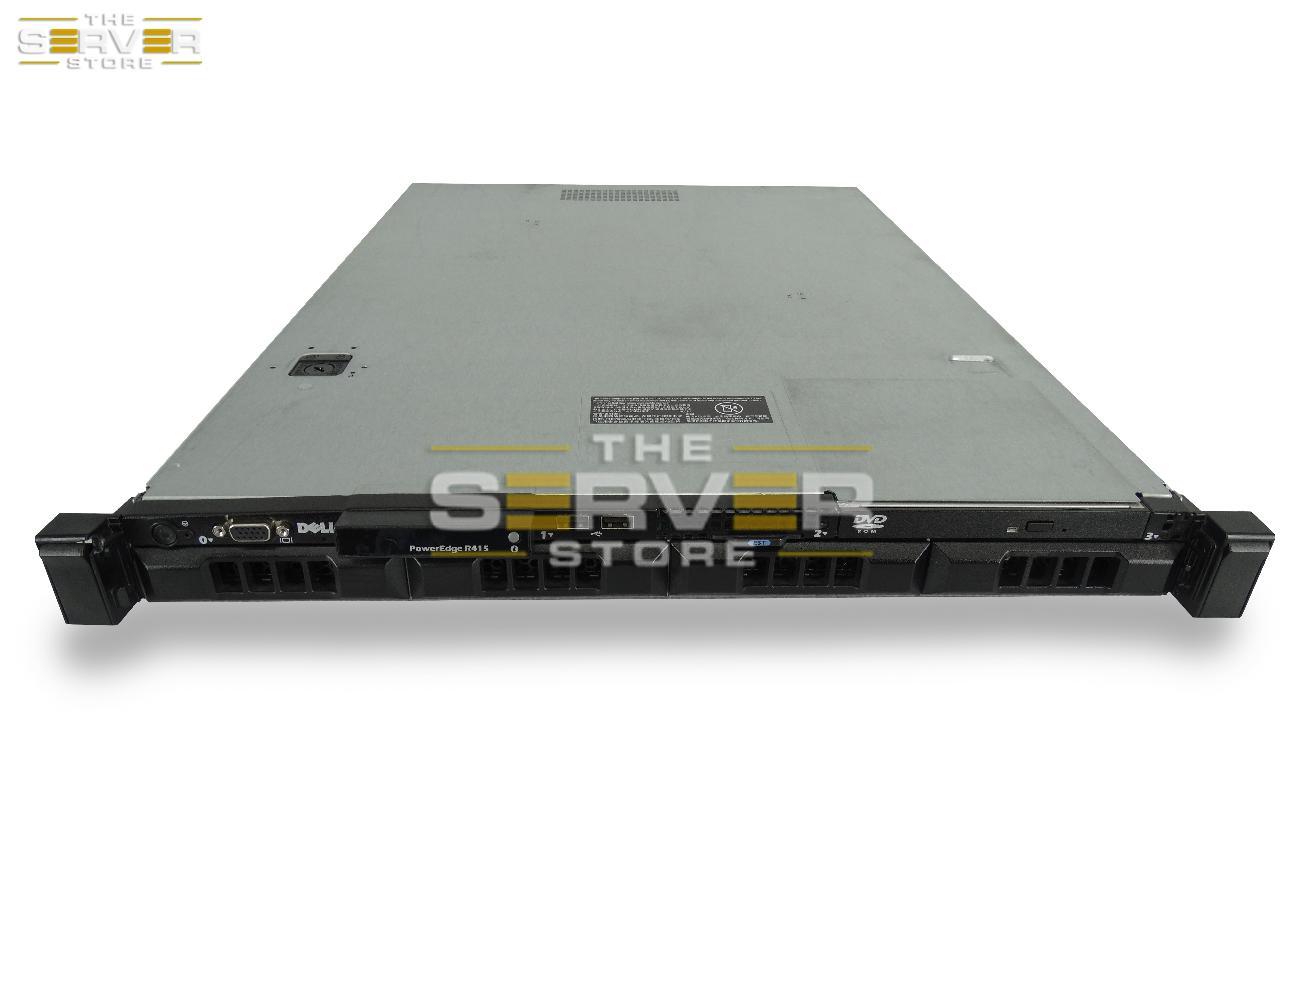 Dell PowerEdge R415 4x LFF 1U Server